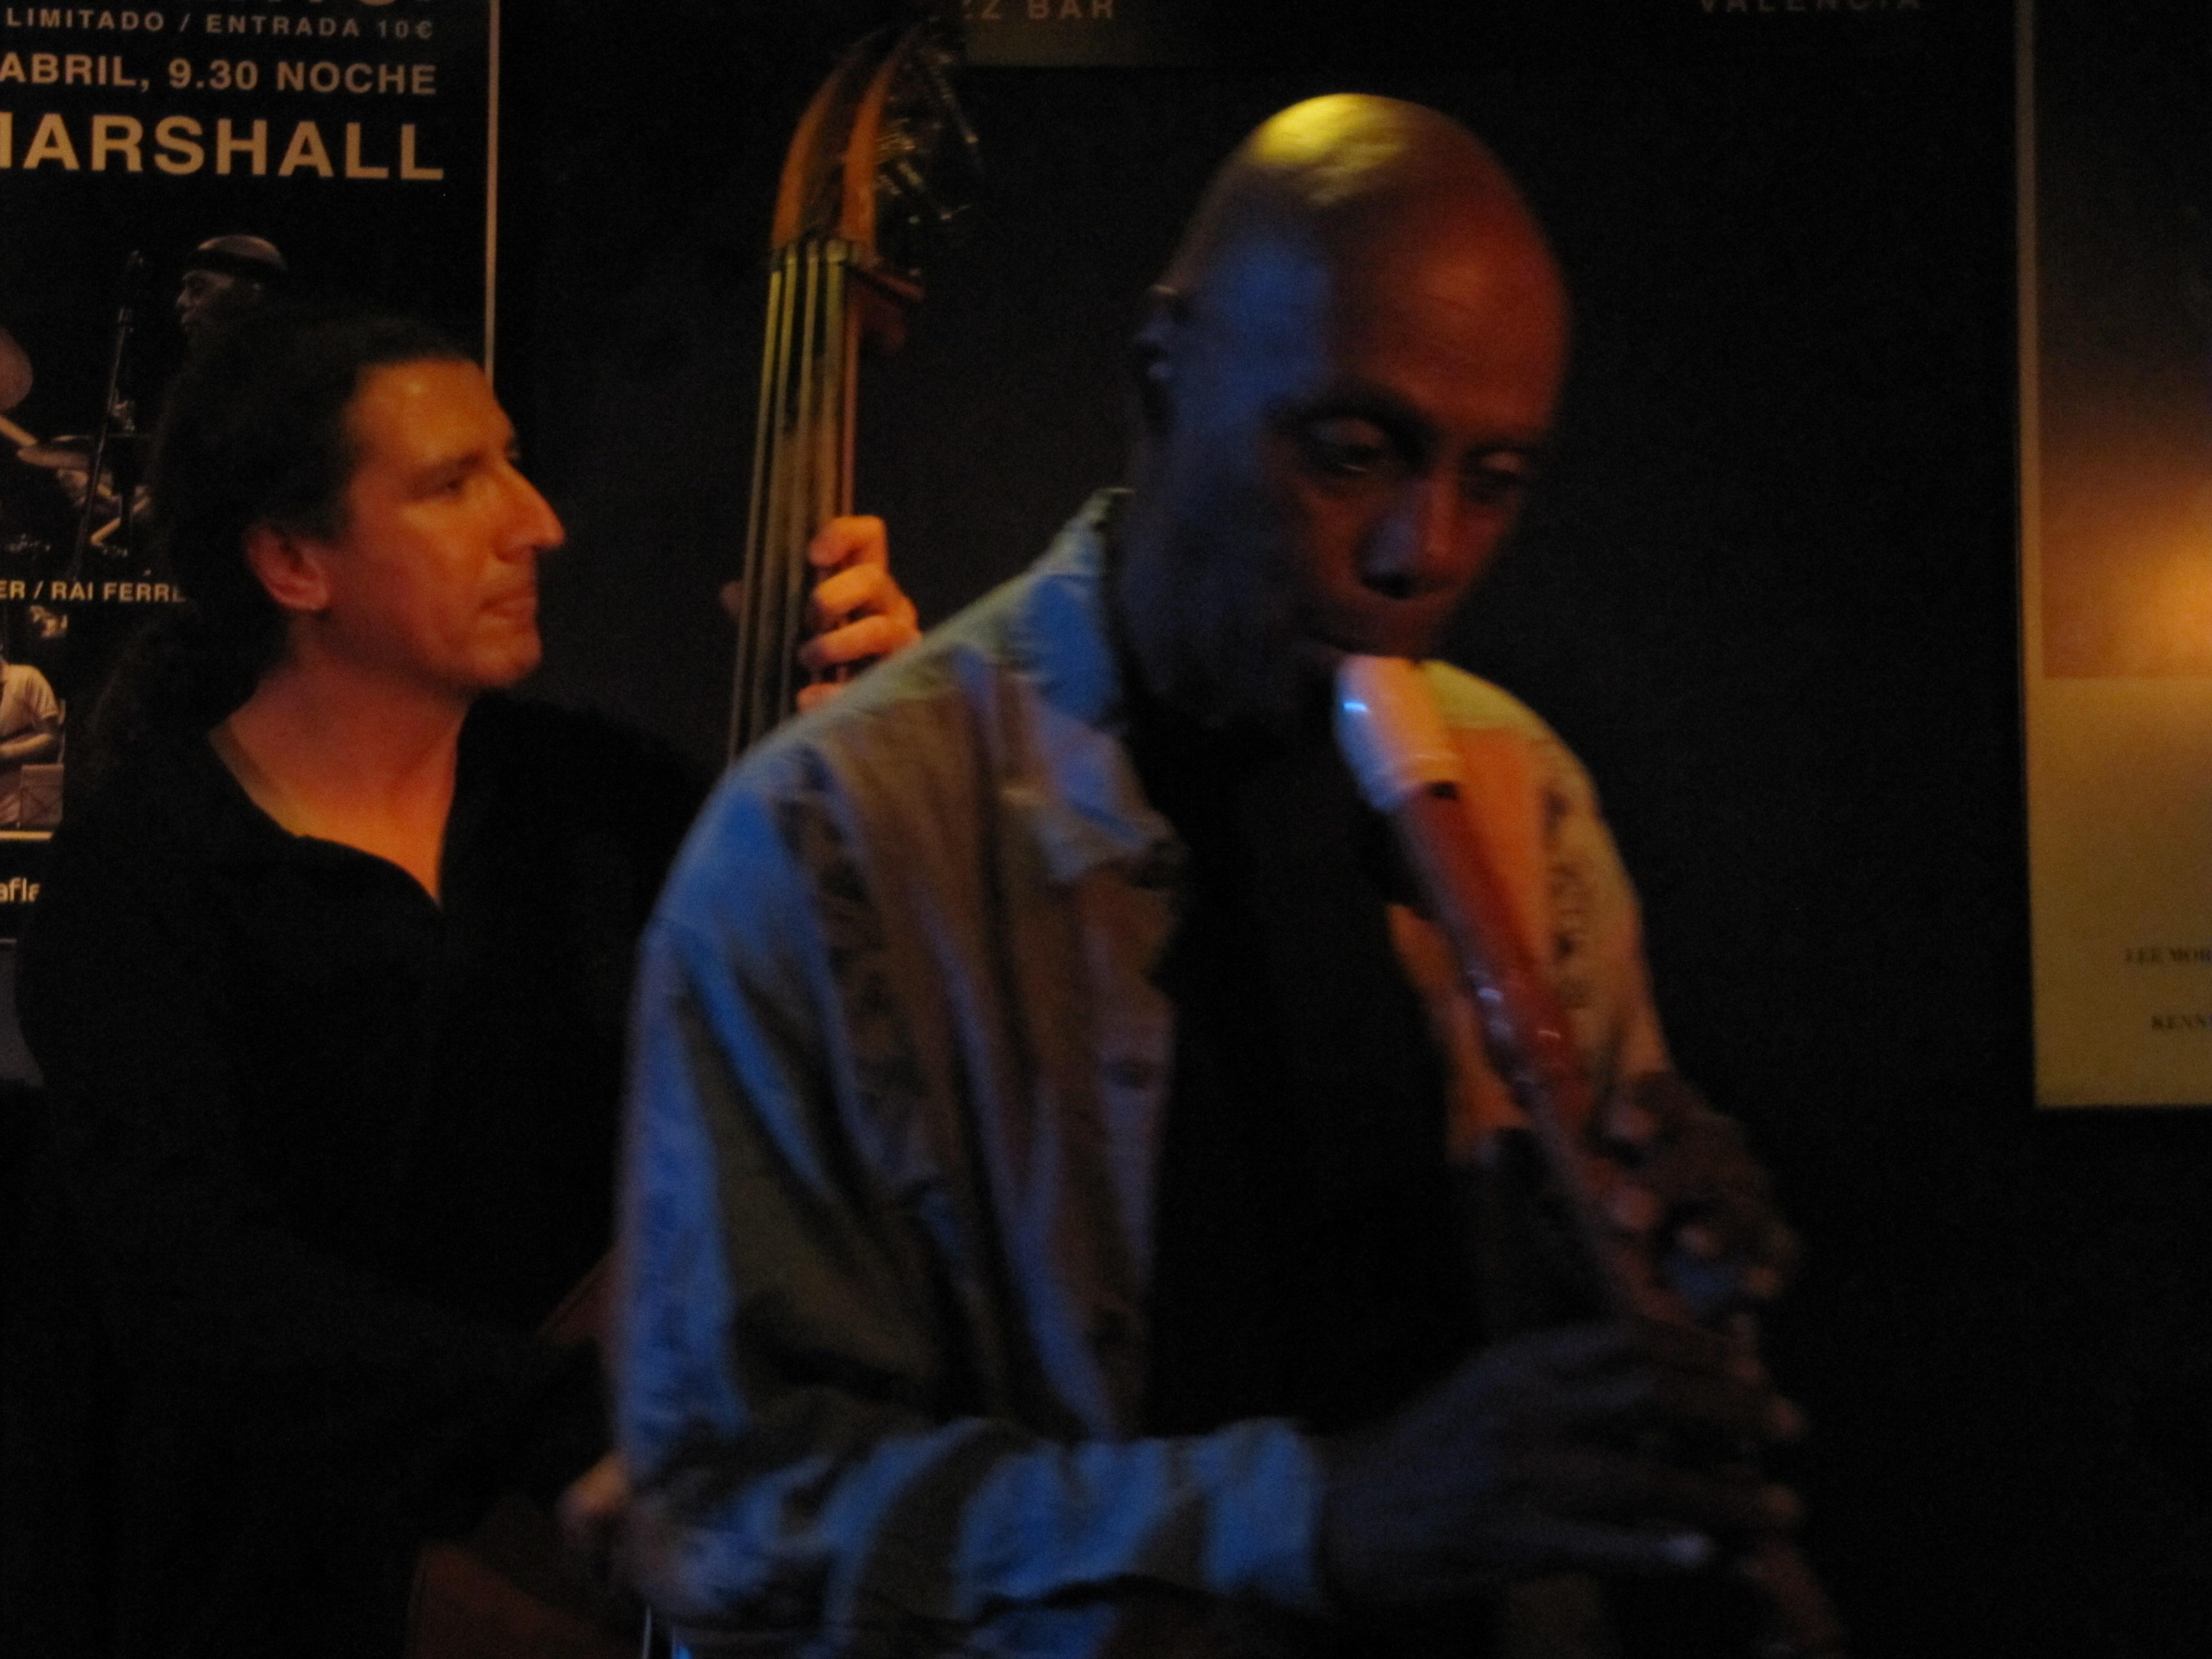 Eddie Marshall Playing Alto Recorder